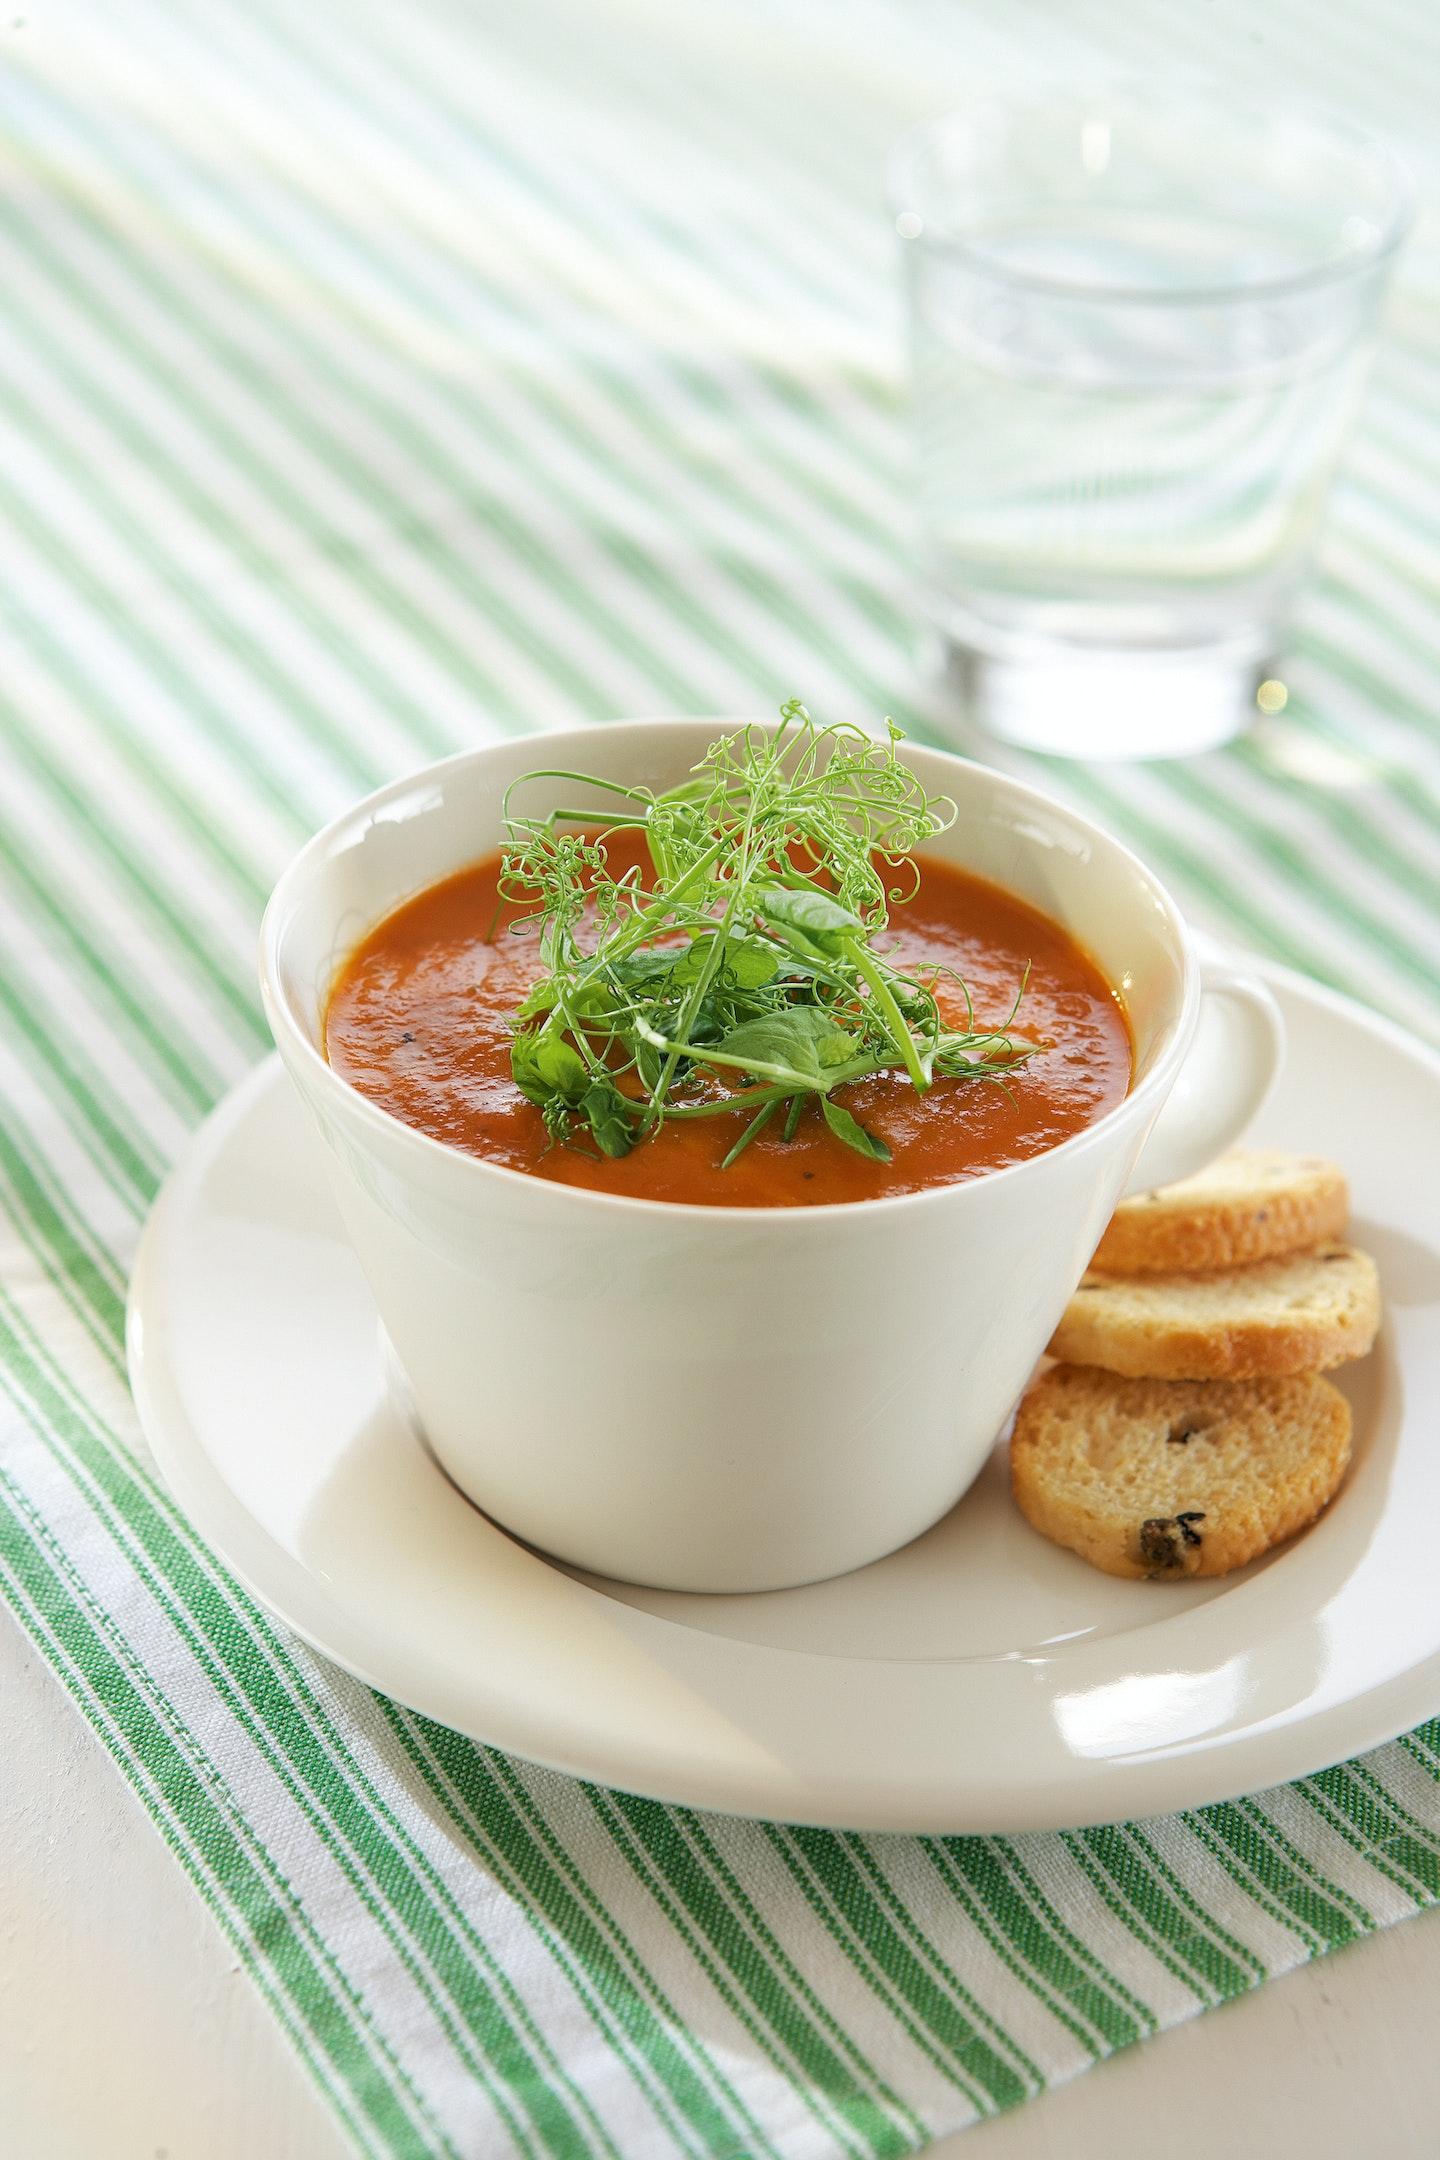 Helppo porkkana-tomaattikeitto